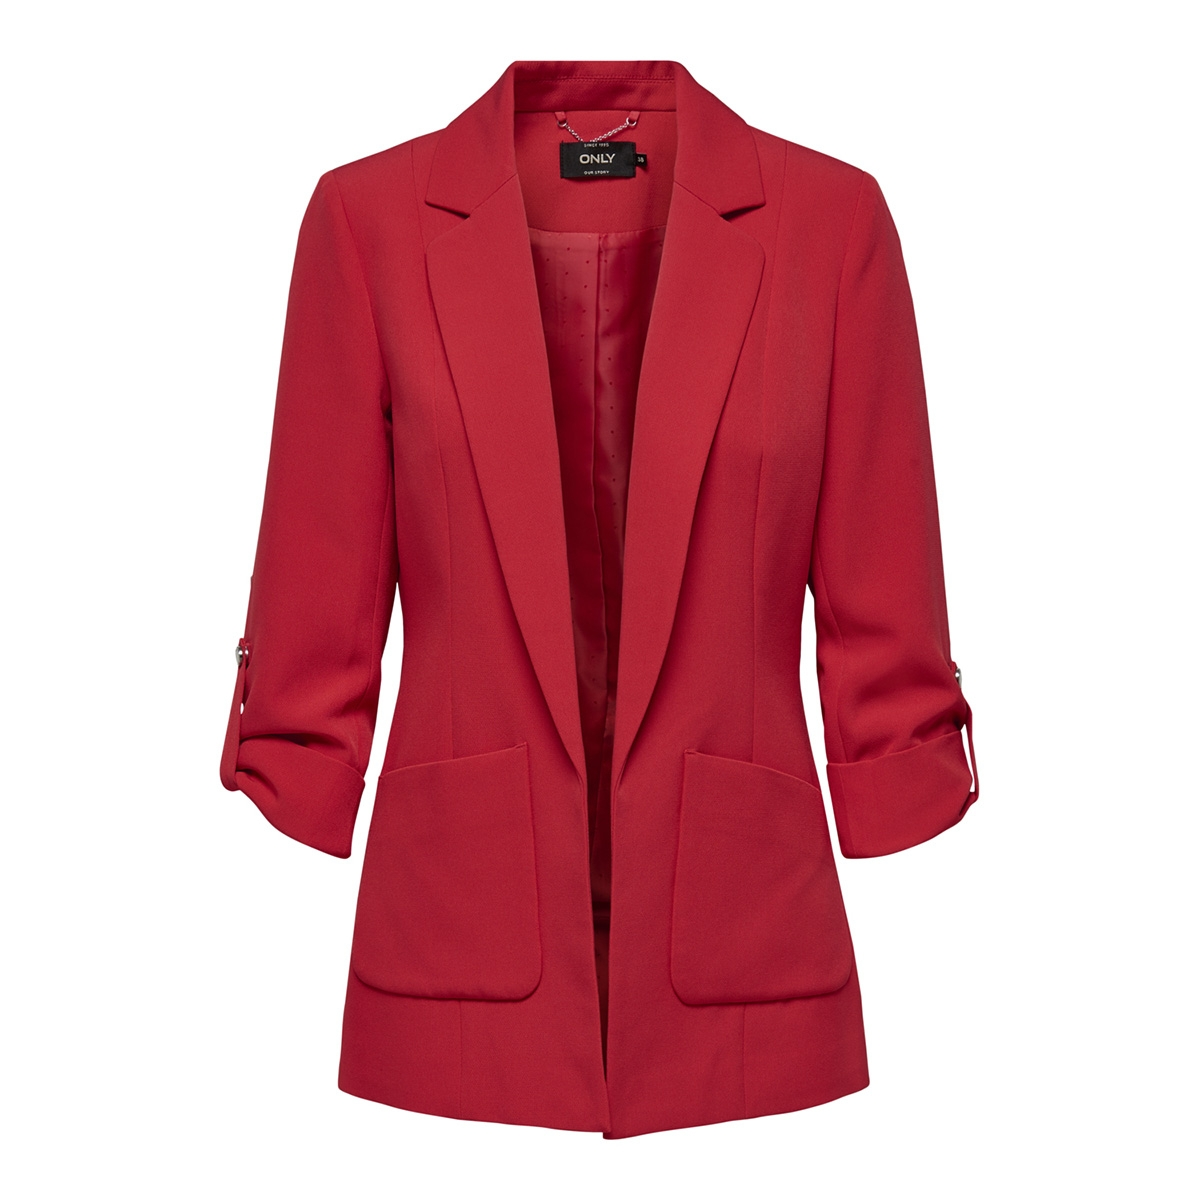 onlkayla 3/4 anna blazer tlr 15169256 only blazer mars red